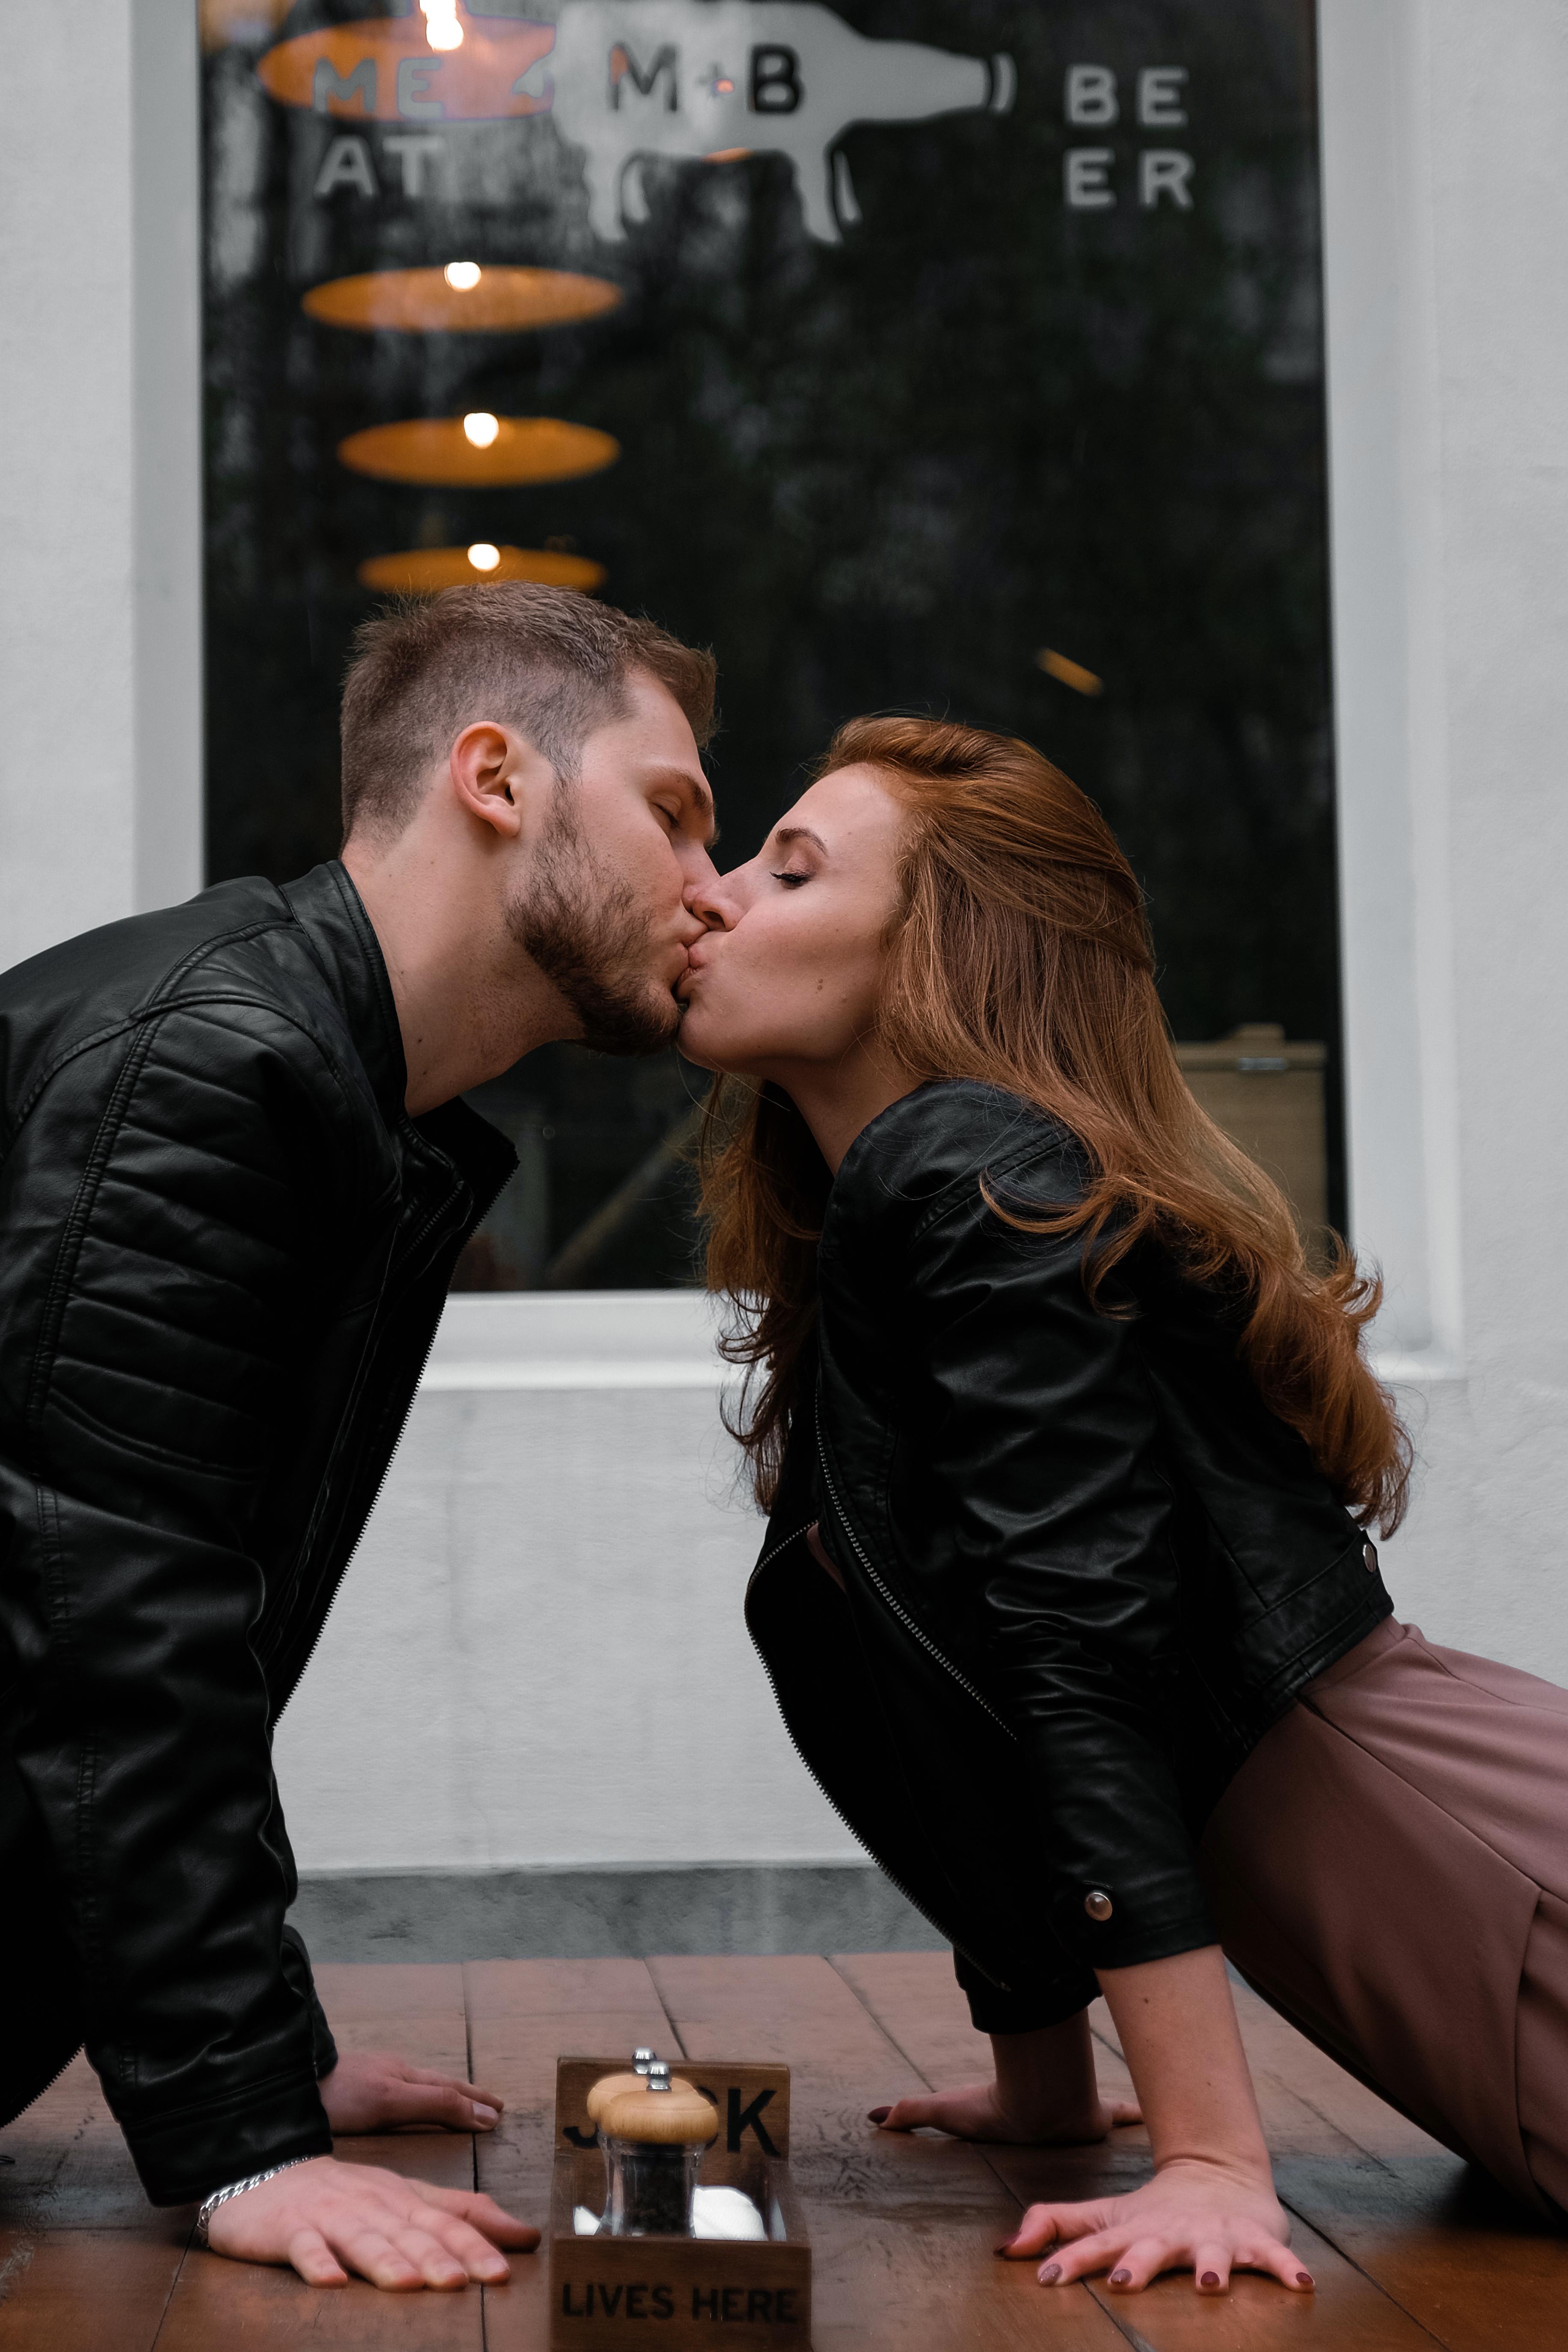 Kissing Couple Wearing Black Jackets